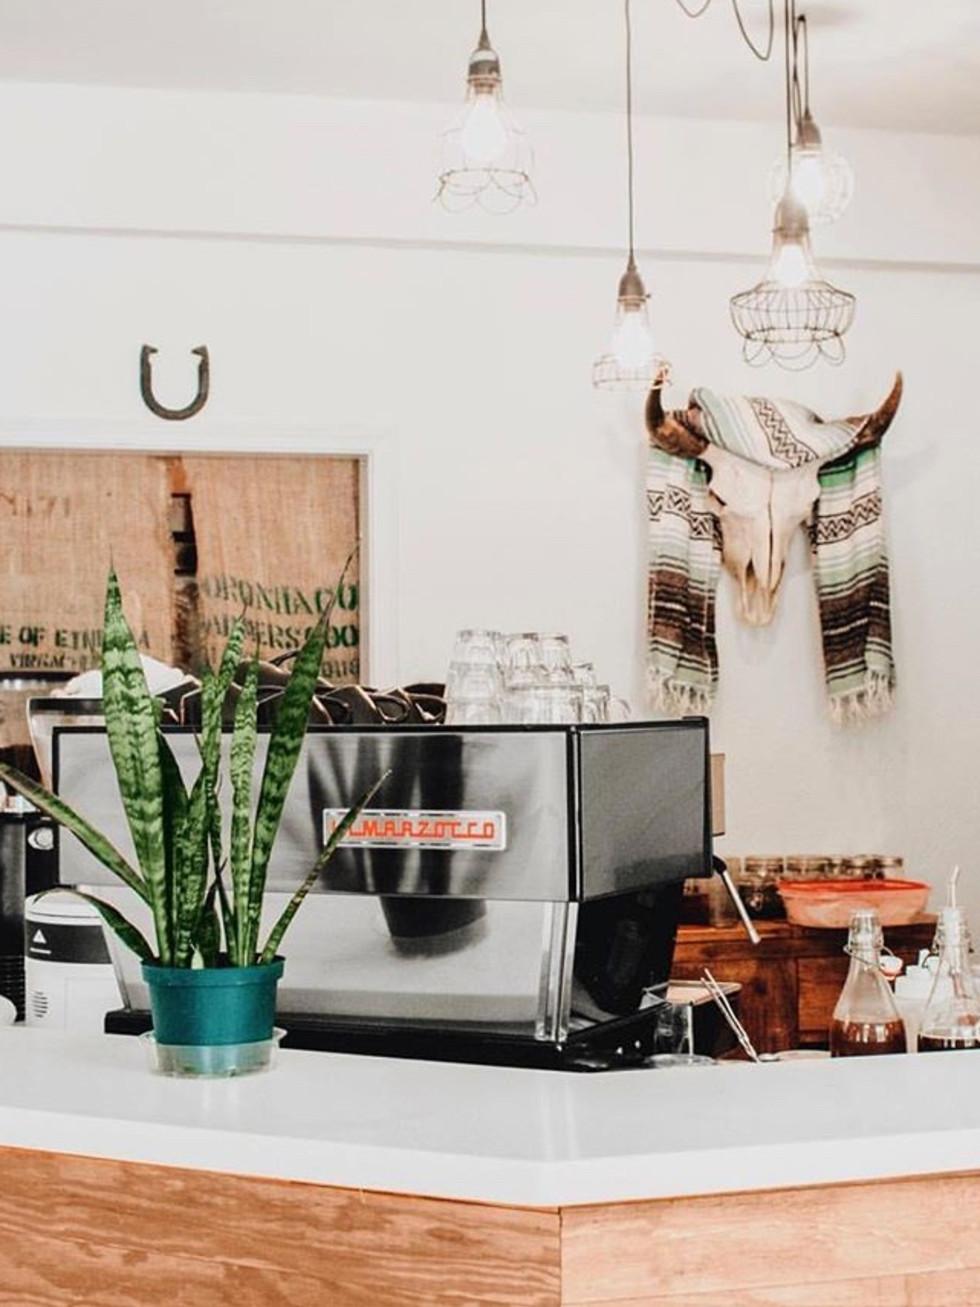 Revival coffee east austin